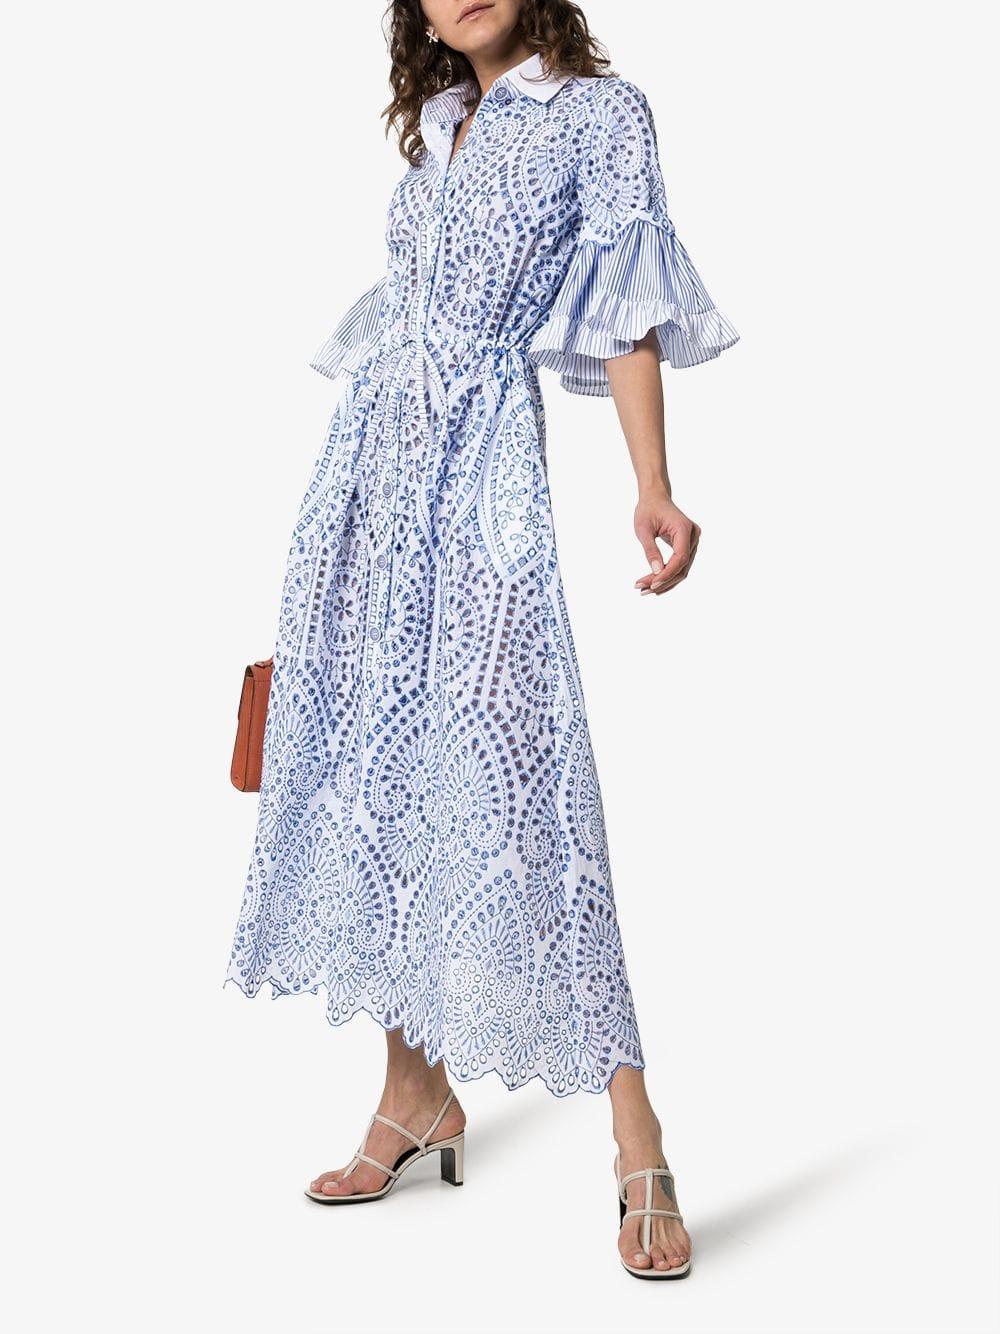 61804d04c67 EVI GRINTELA Valerie Lace Detail Collared Midi White Dress